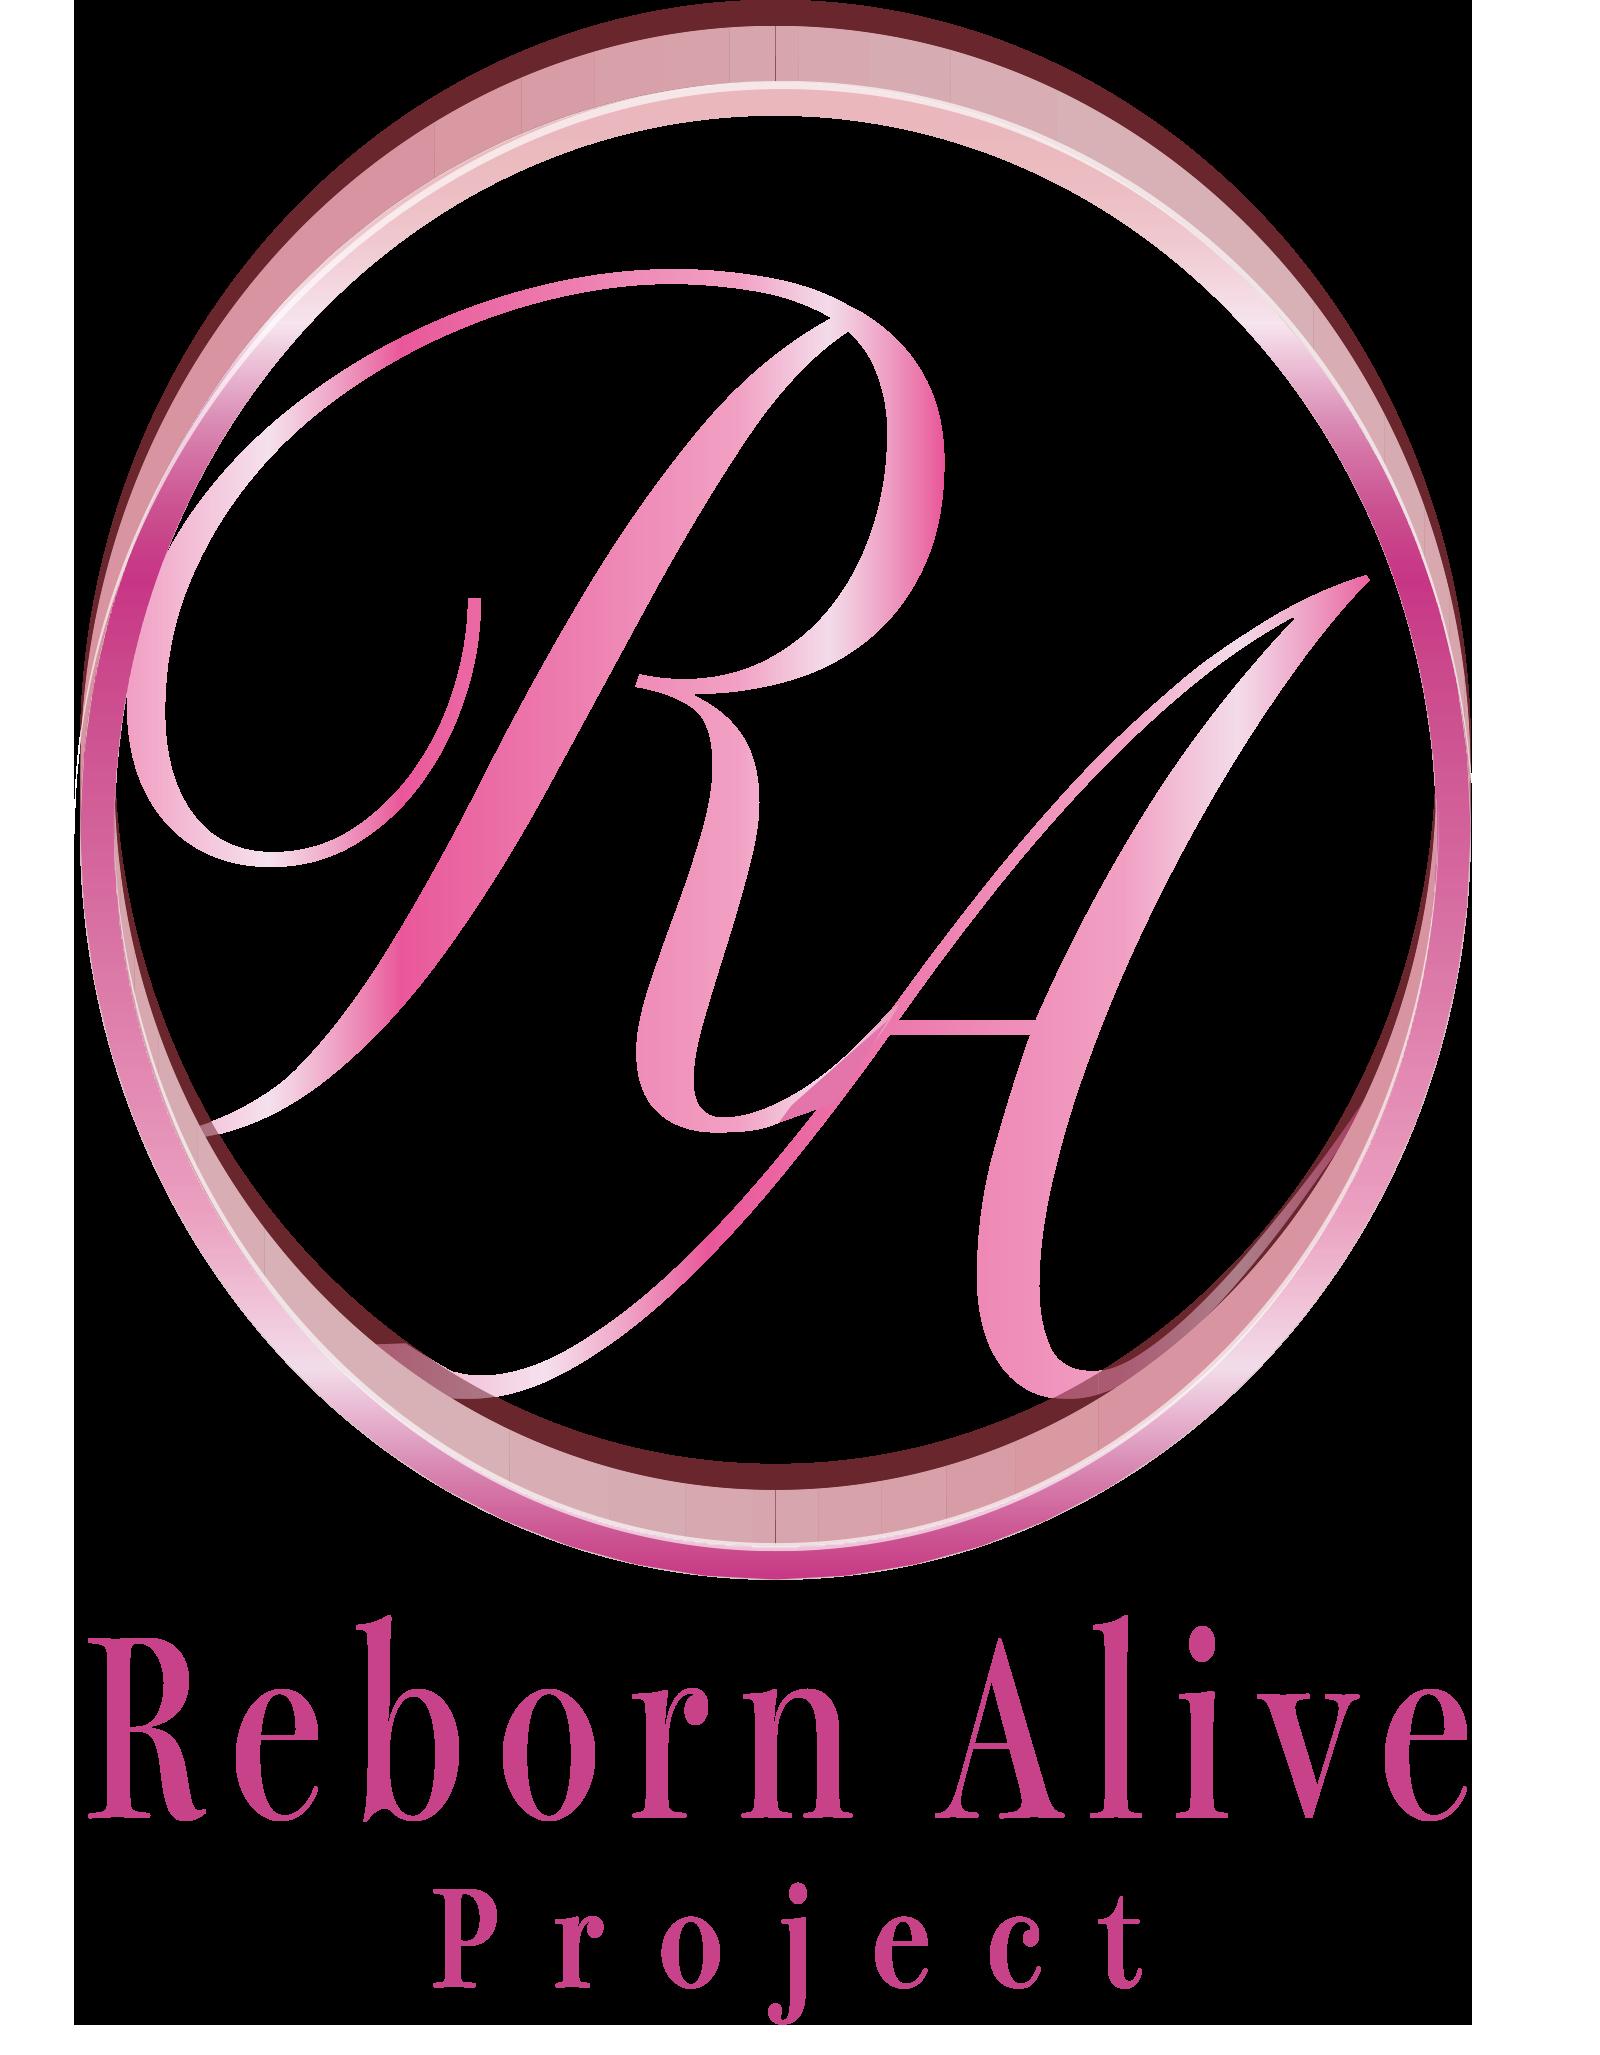 reborn alive